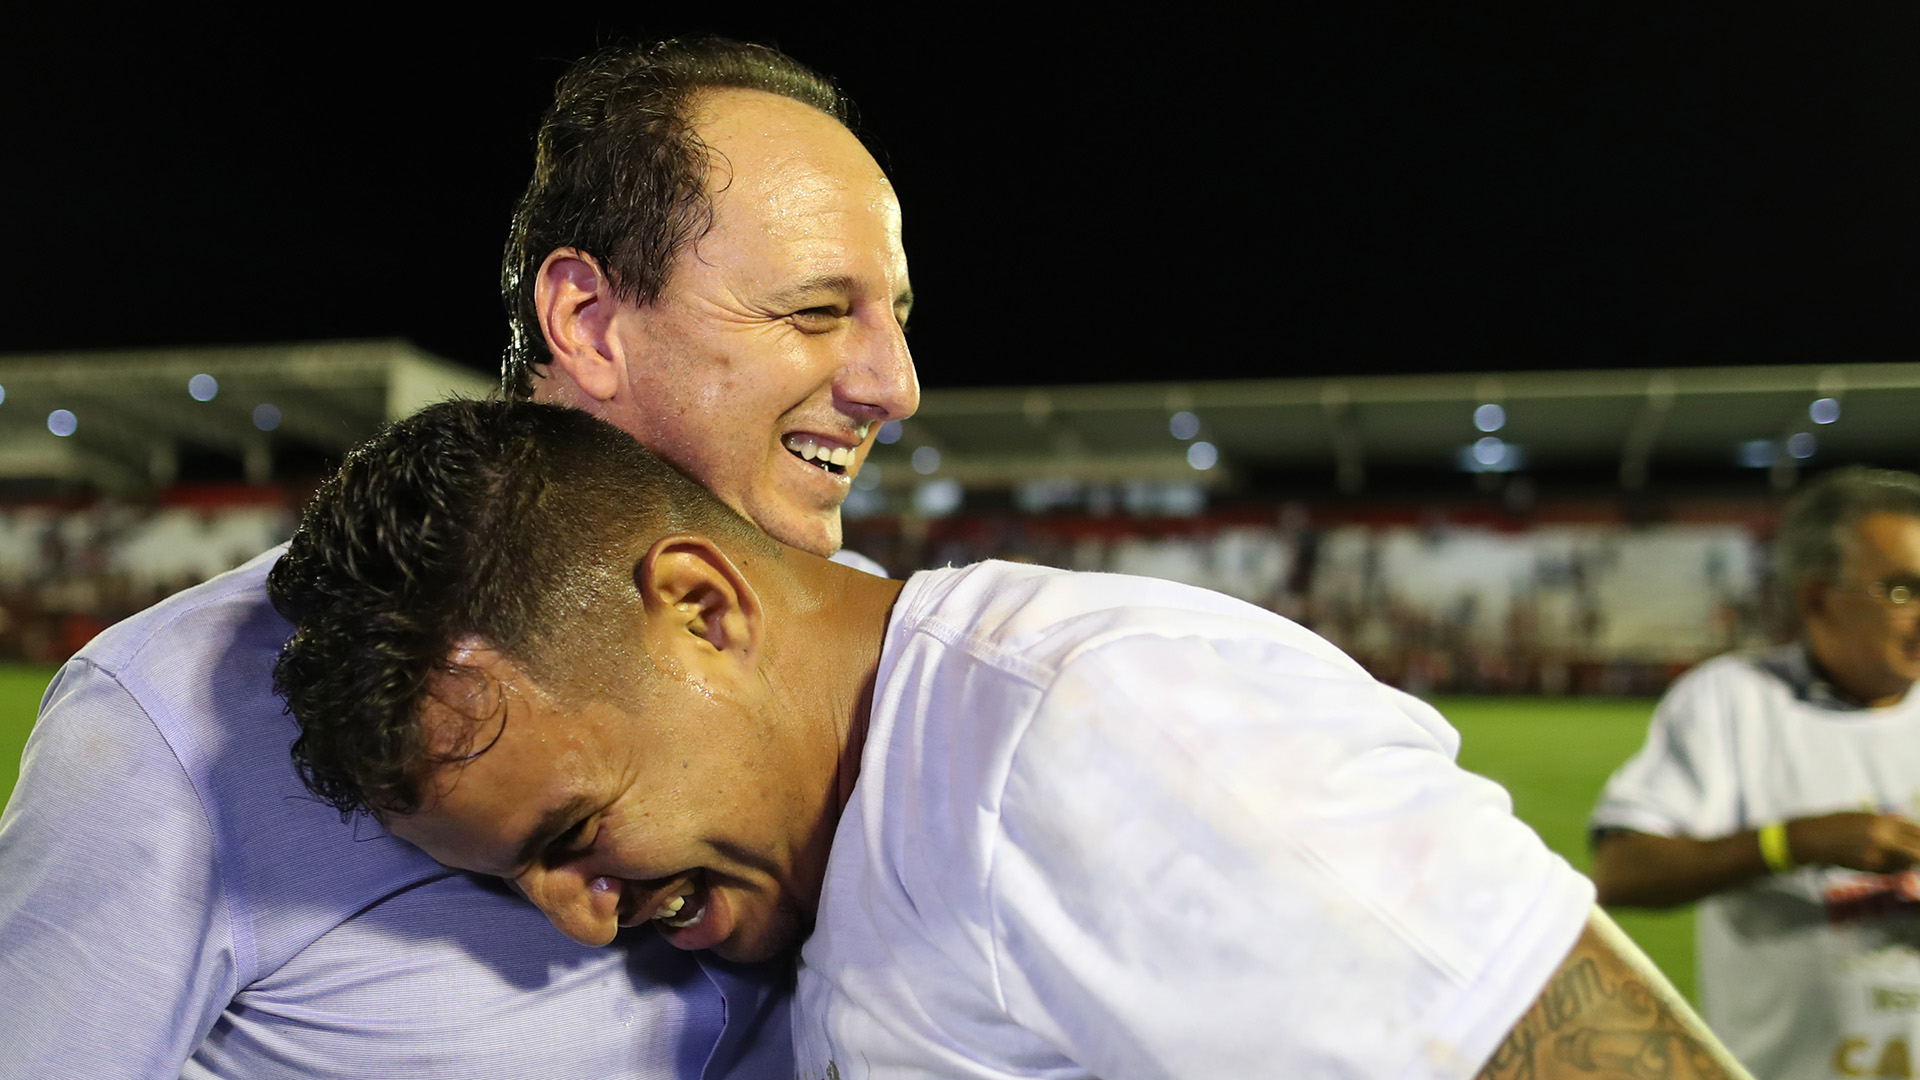 Rogerio Ceni Fortaleza campeão Brasileirão Série B 2018 10112018